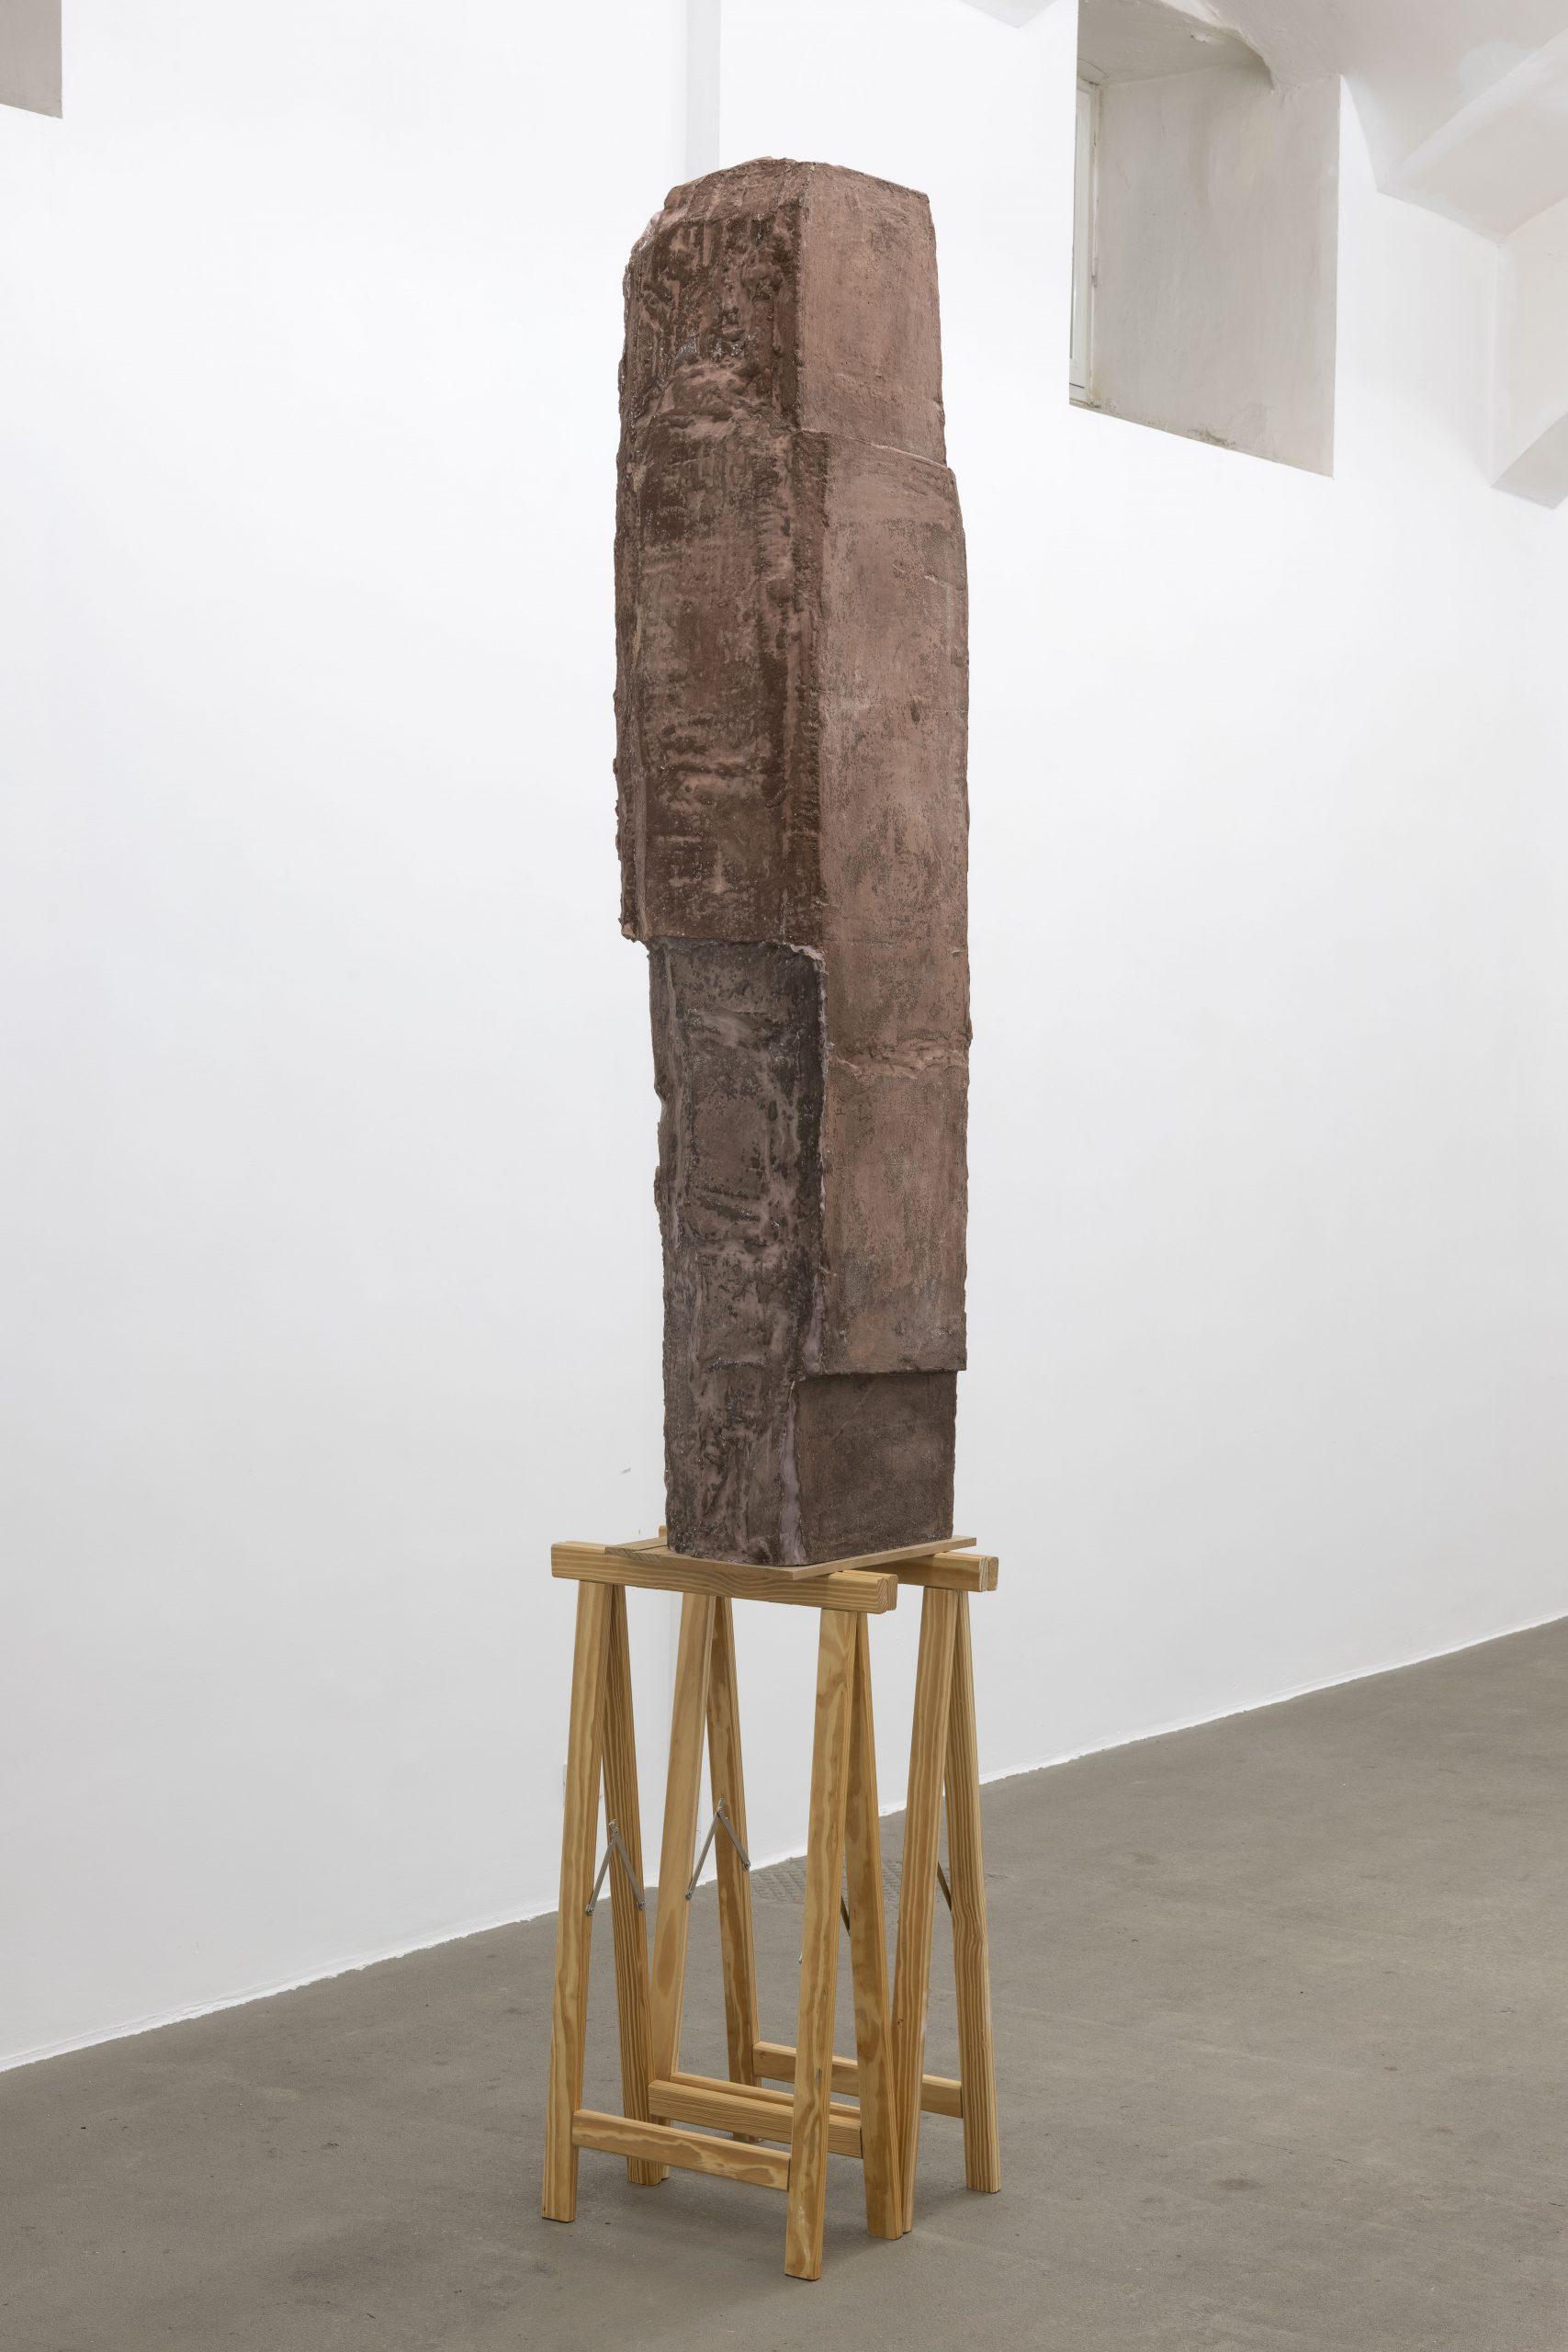 Esther Kläs High (Brown), 2017, aqua resin, pigment, wool; Courtesy Kadel Willborn, Düsseldorf; photo Giorgio Benni